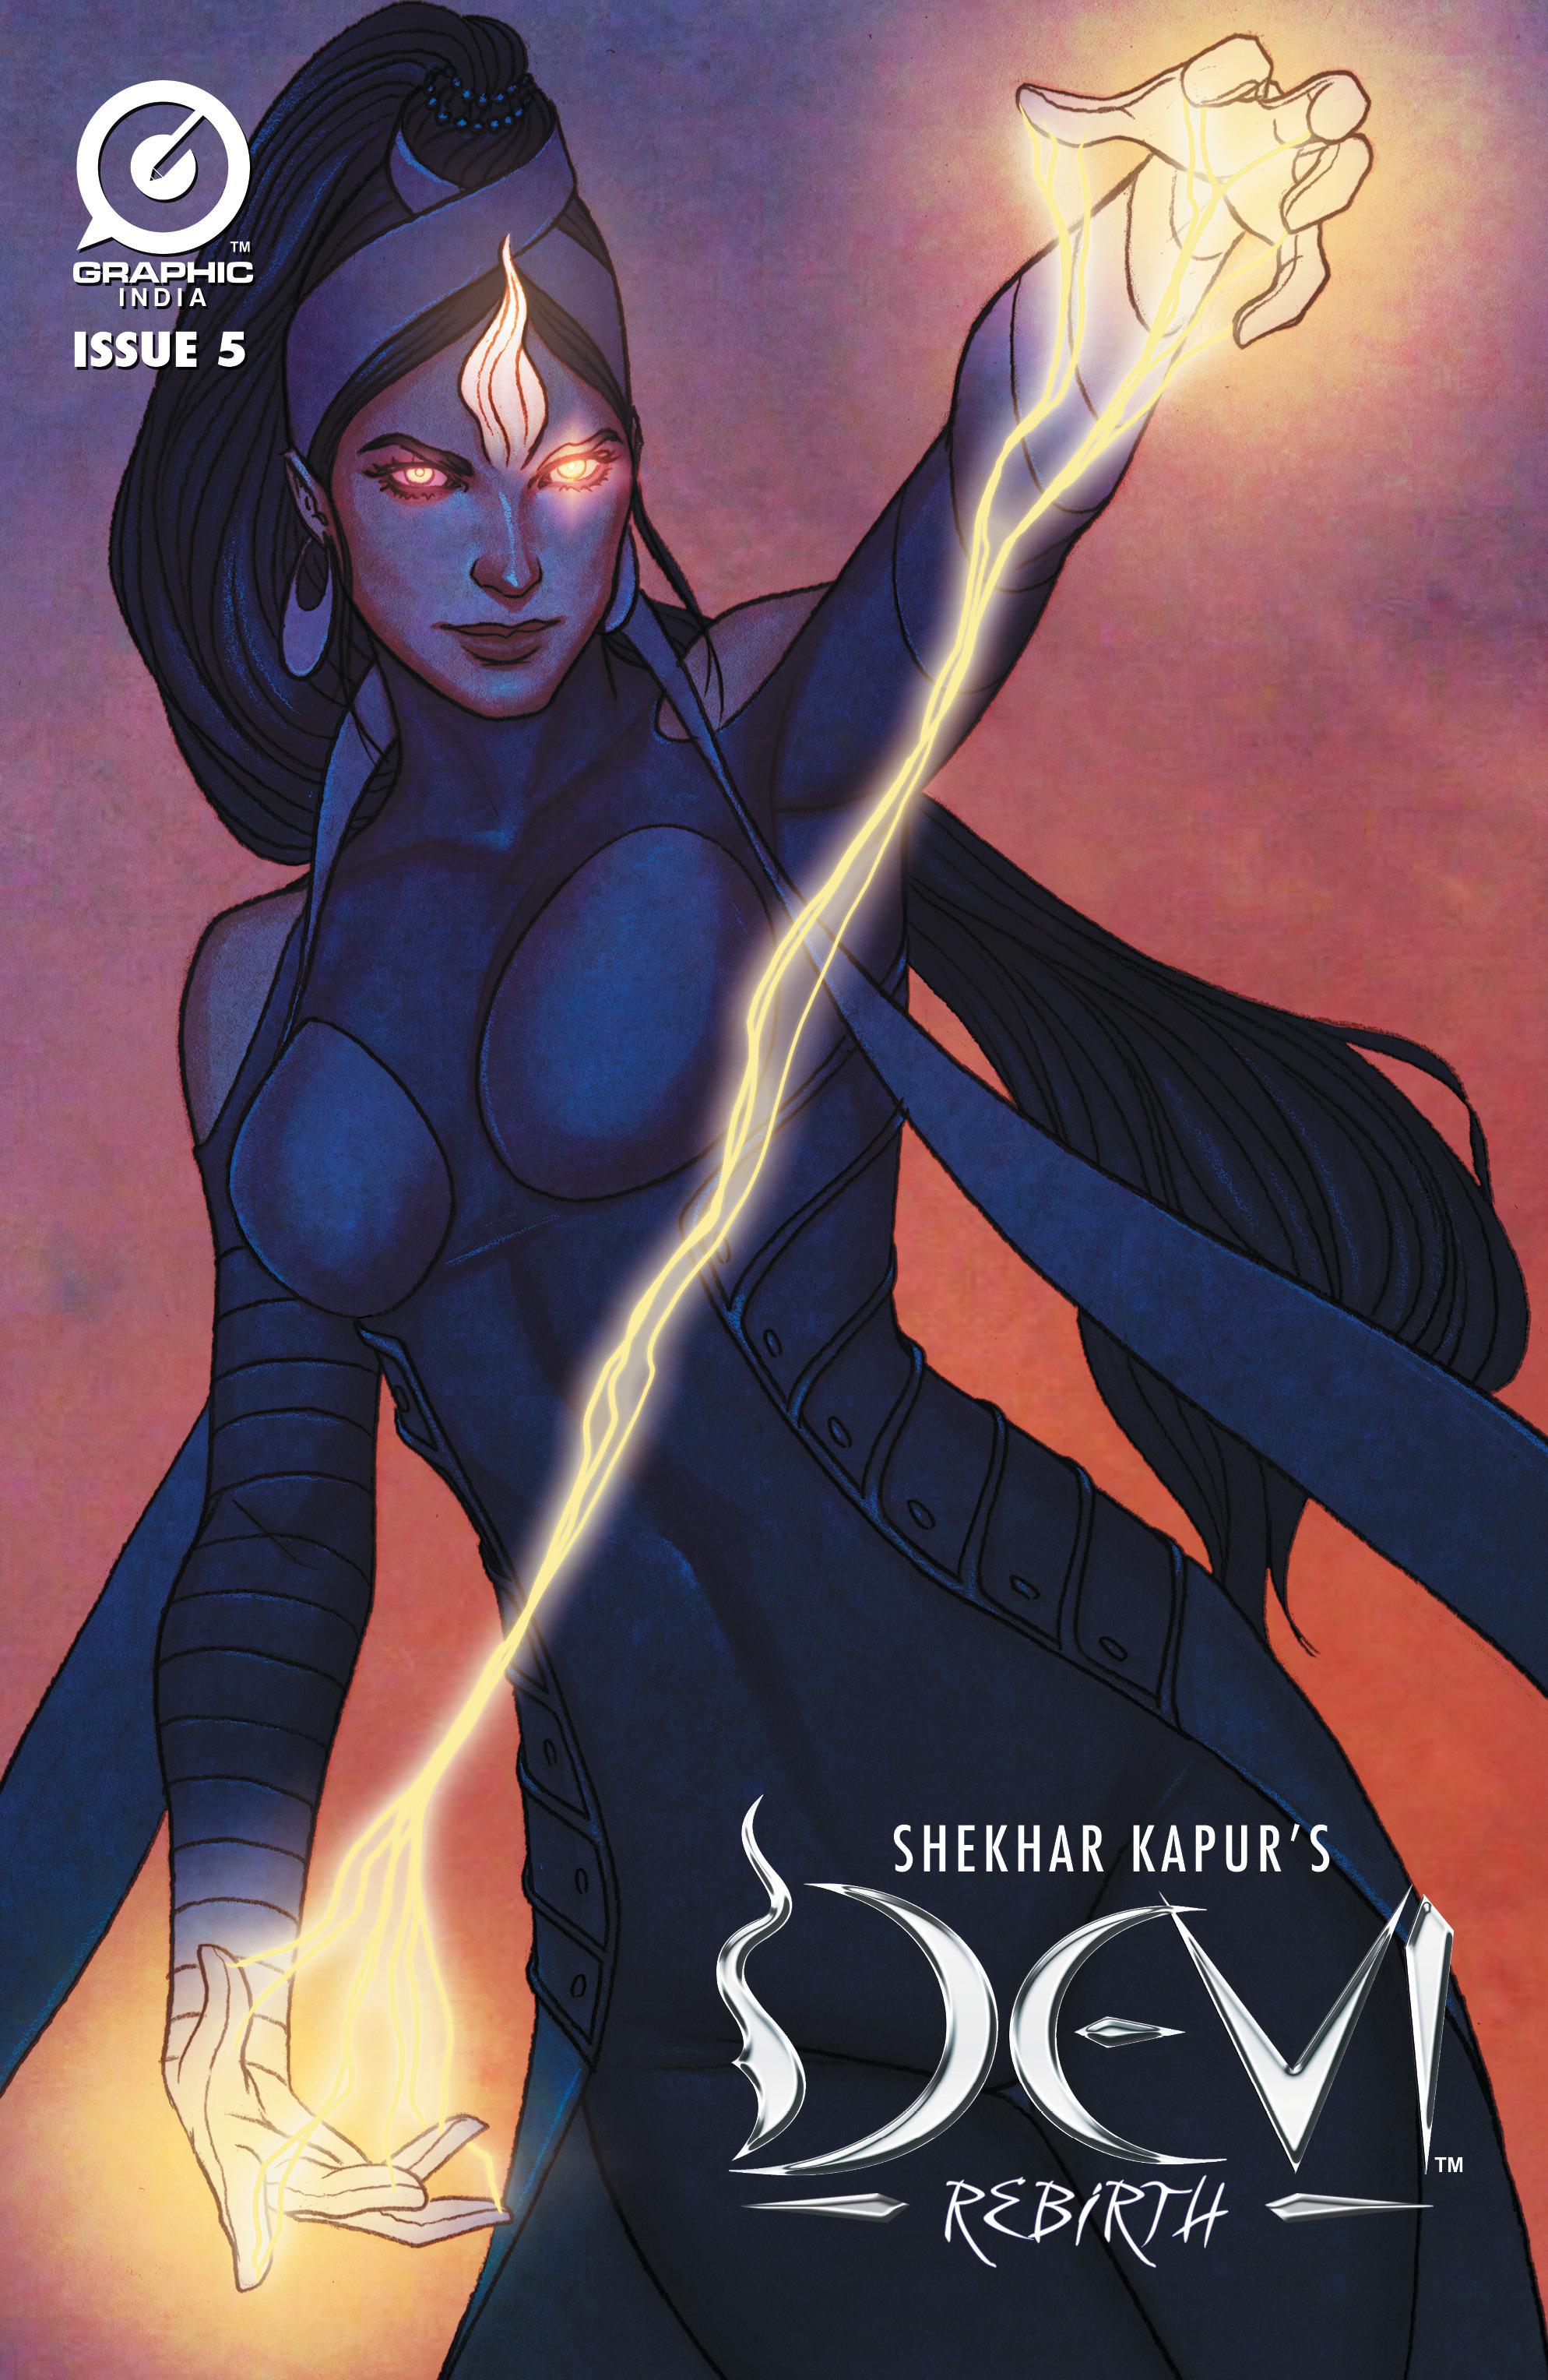 Read online Shekhar Kapur's Devi: Rebirth comic -  Issue #5 - 1